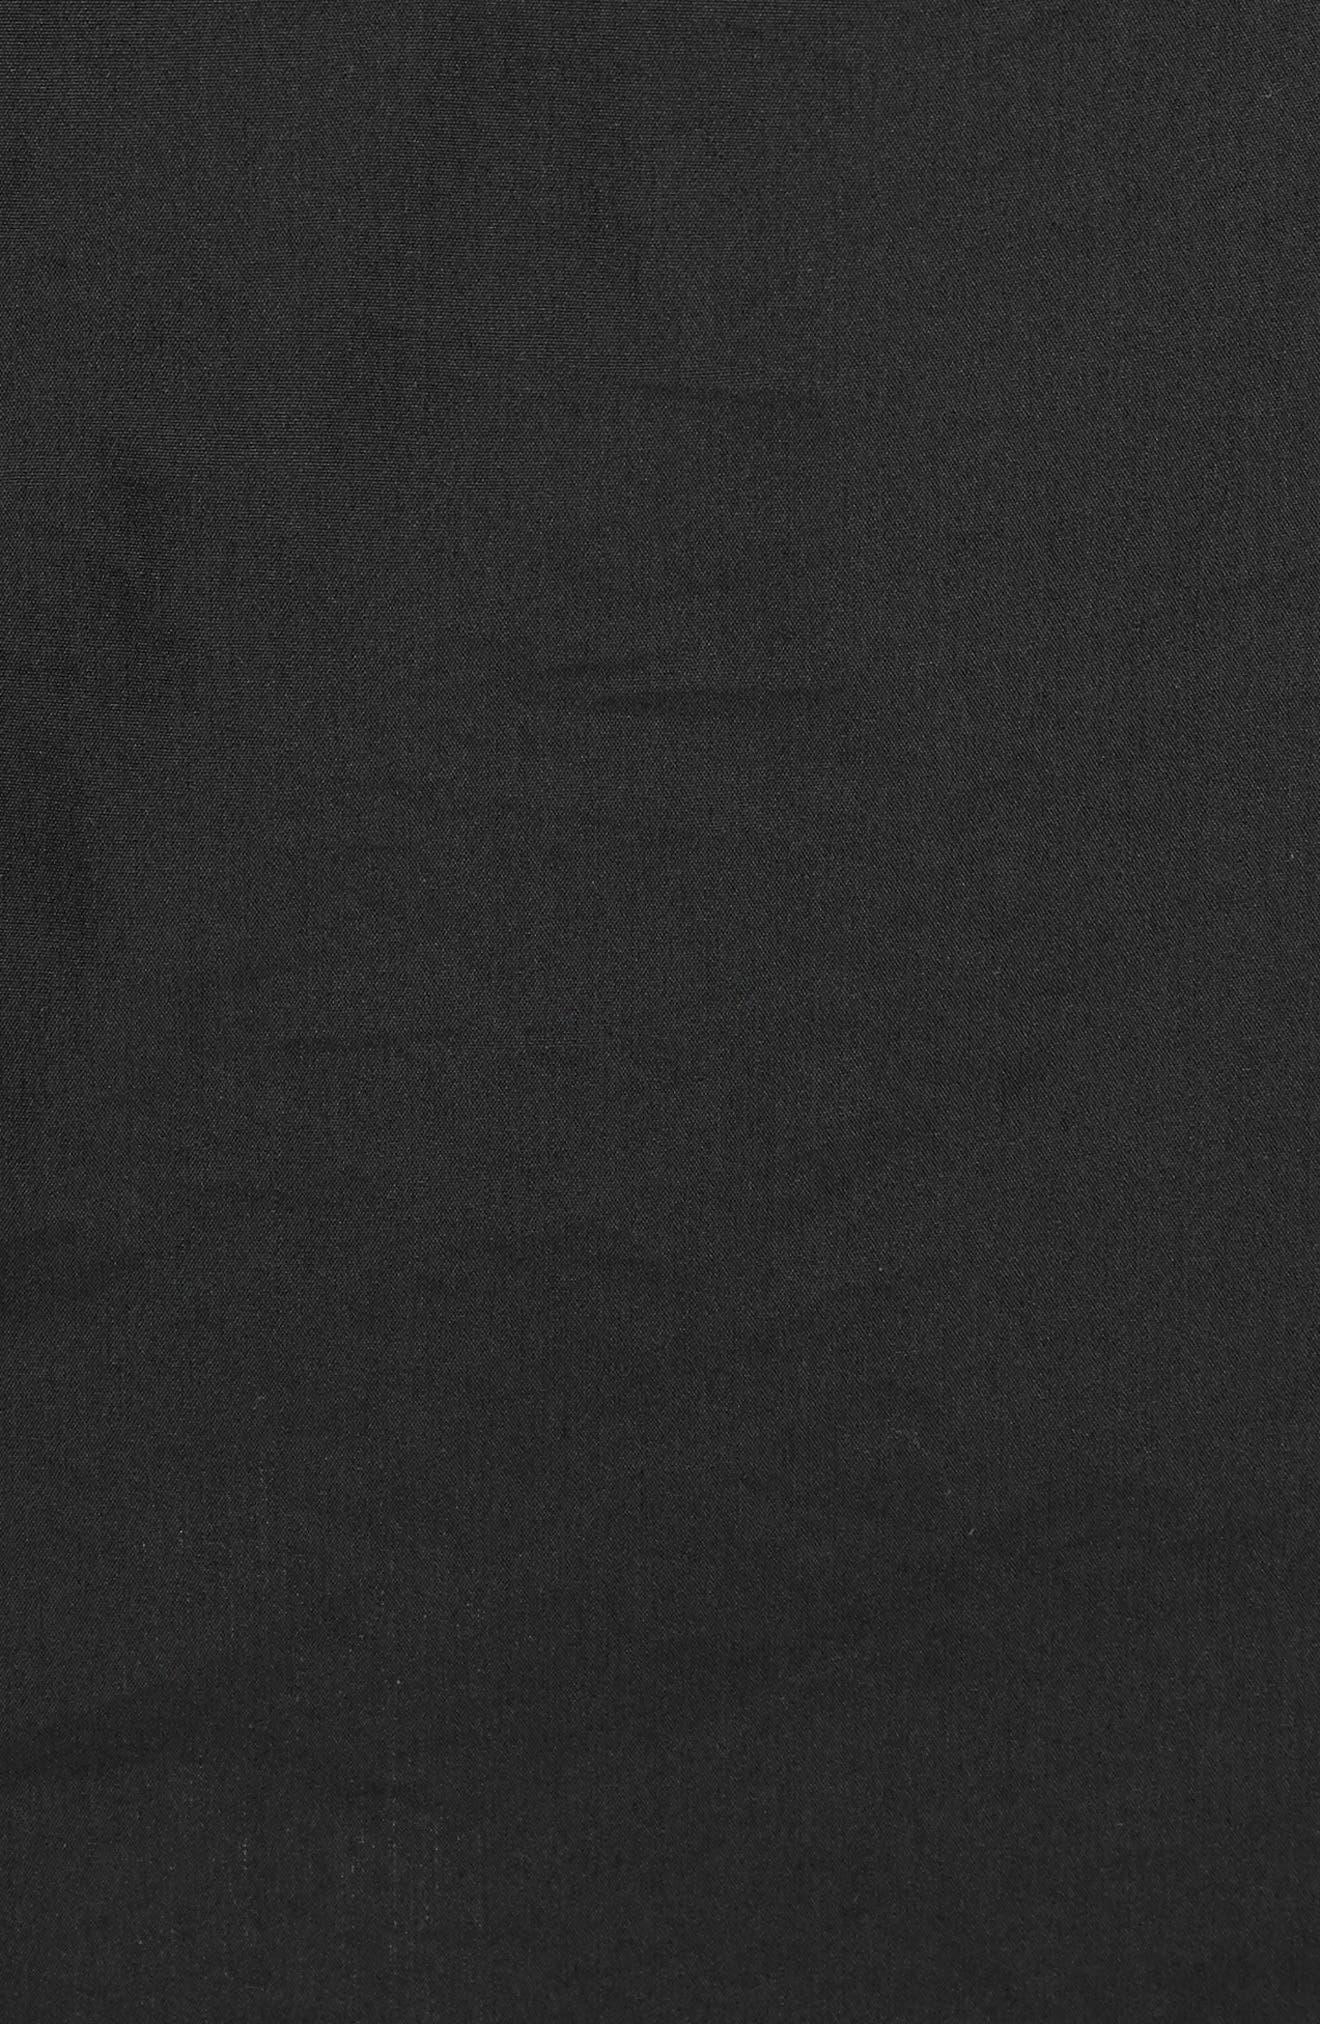 Cotton Poplin Wrap Dress,                             Alternate thumbnail 6, color,                             Black